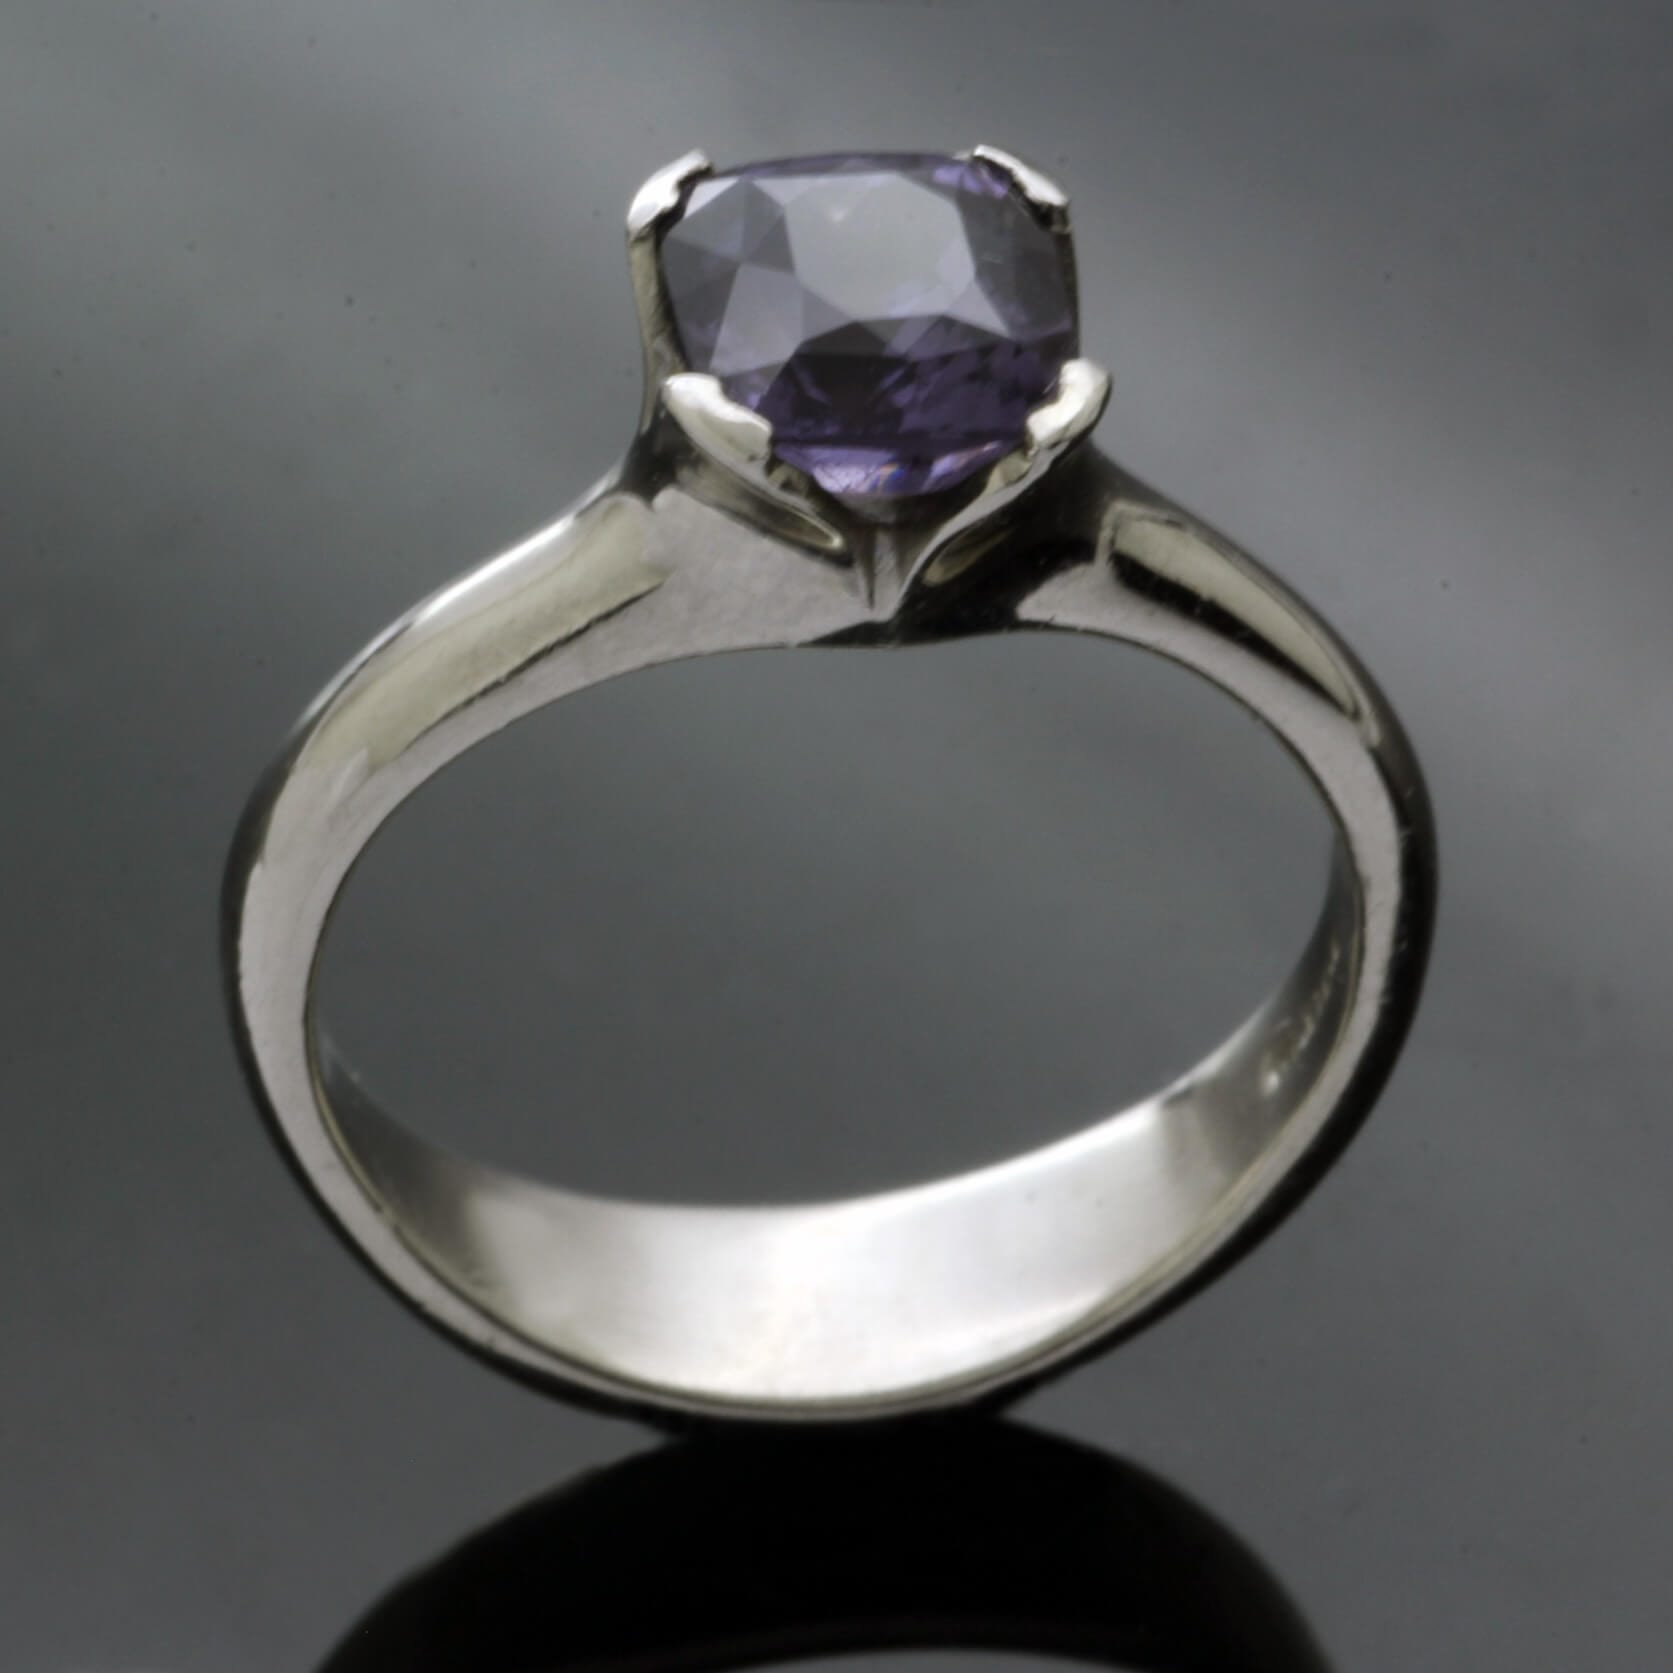 Mauve Spinel gem set in Palladium handcrafted engagement ring